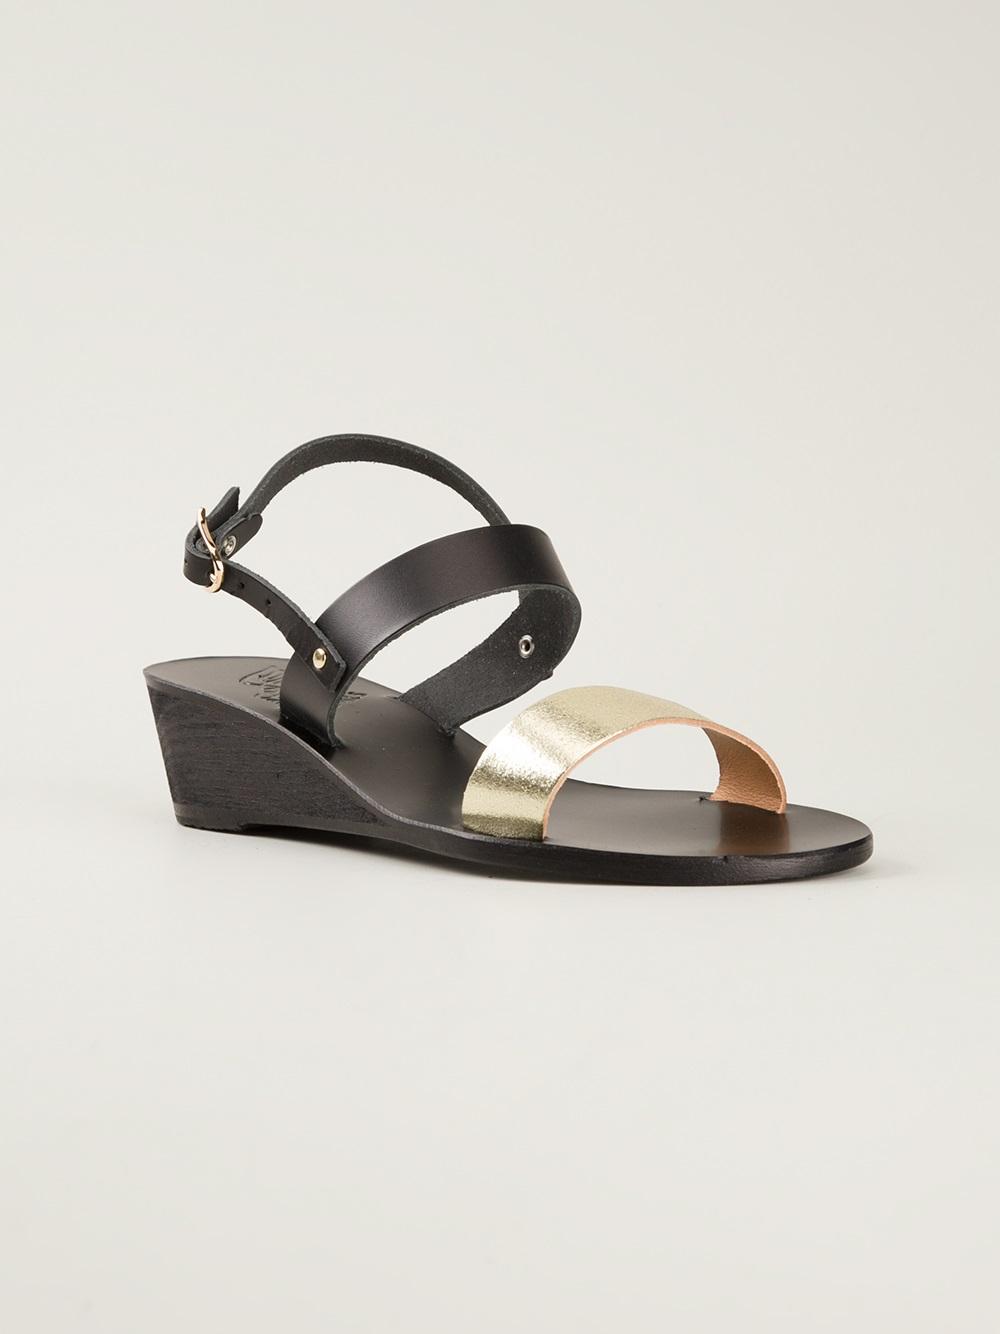 86b21382b99 Lyst - Ancient Greek Sandals Clio Wedge Sandal in Black